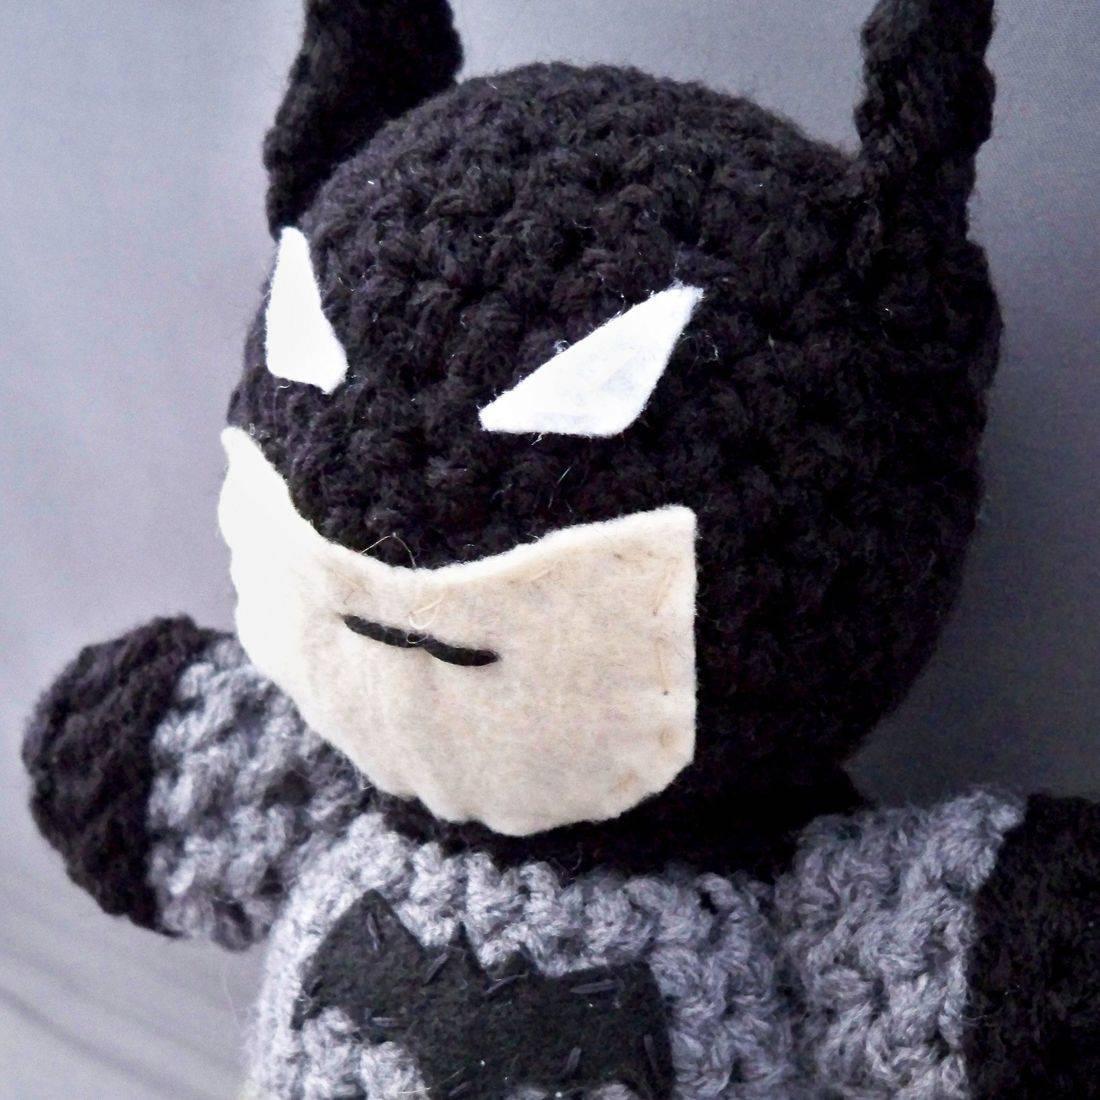 Batman, Justice League, Batman Beyond, anime, cartoon, comicbook, superhero, crochet, plush, doll, handmade,  Bruce Wayne